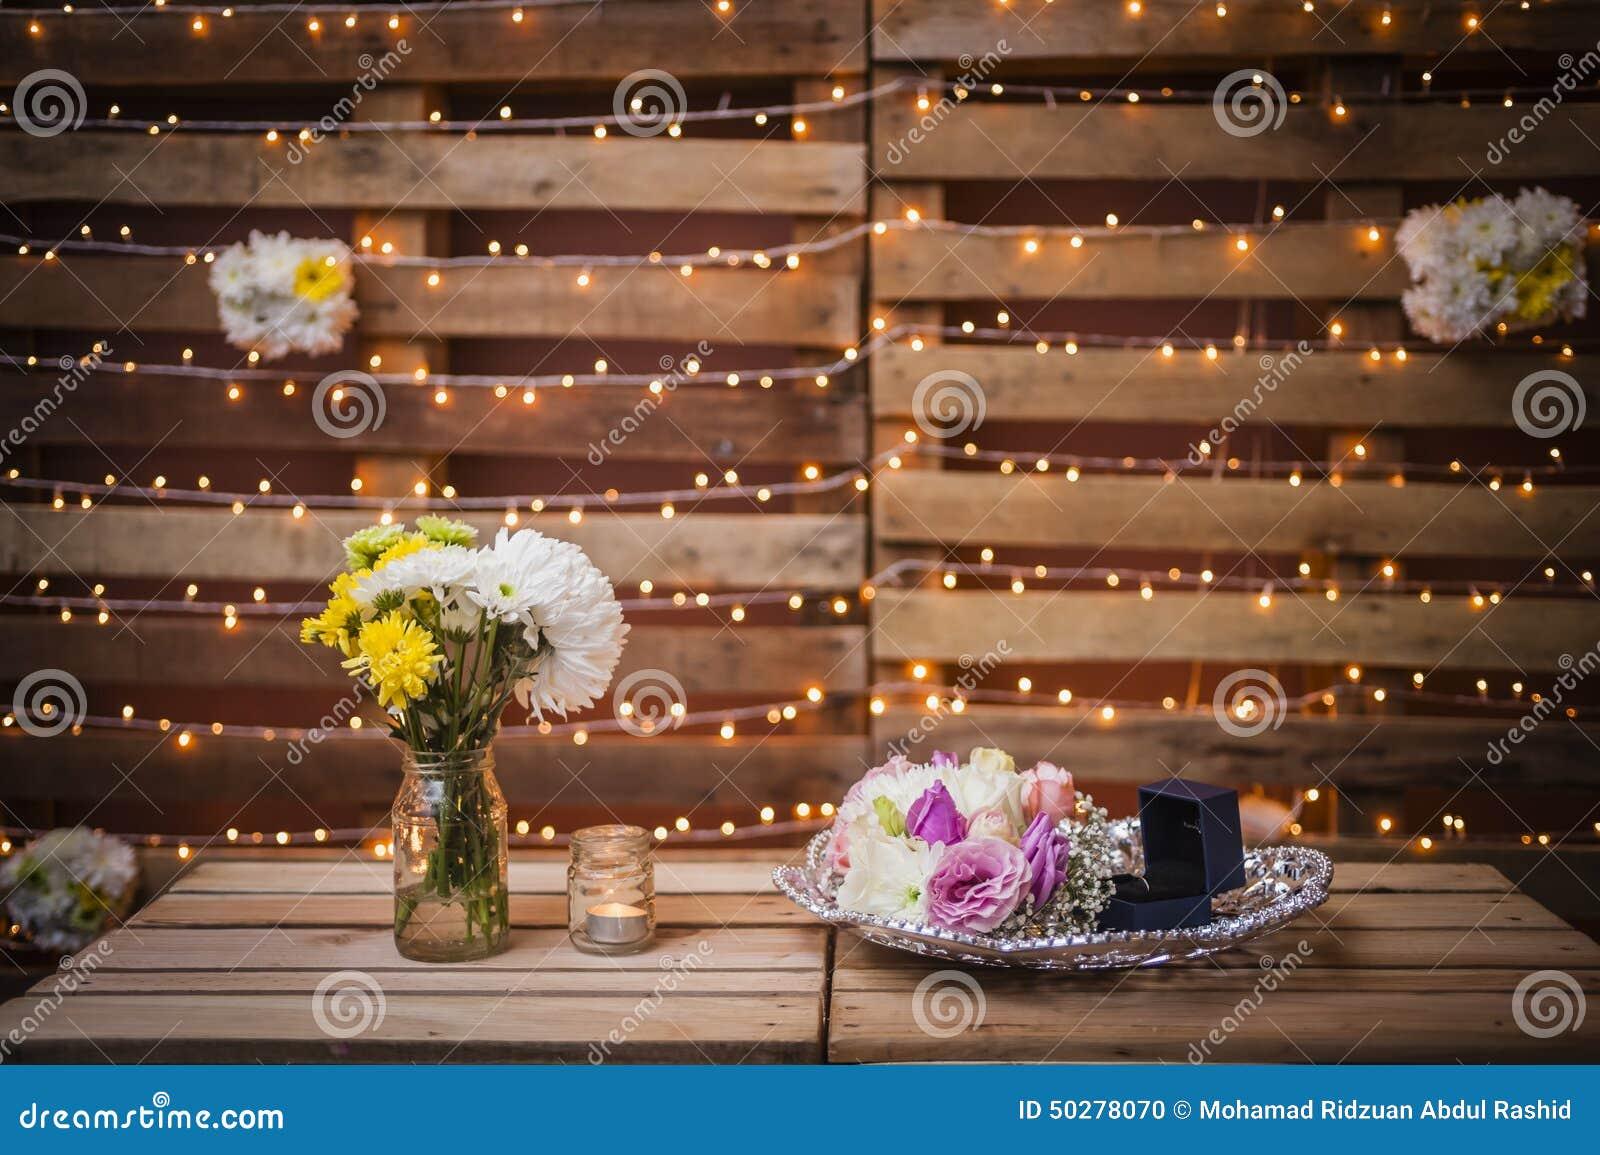 Wedding gift decoration stock photo image of still decoration royalty free stock photo junglespirit Gallery